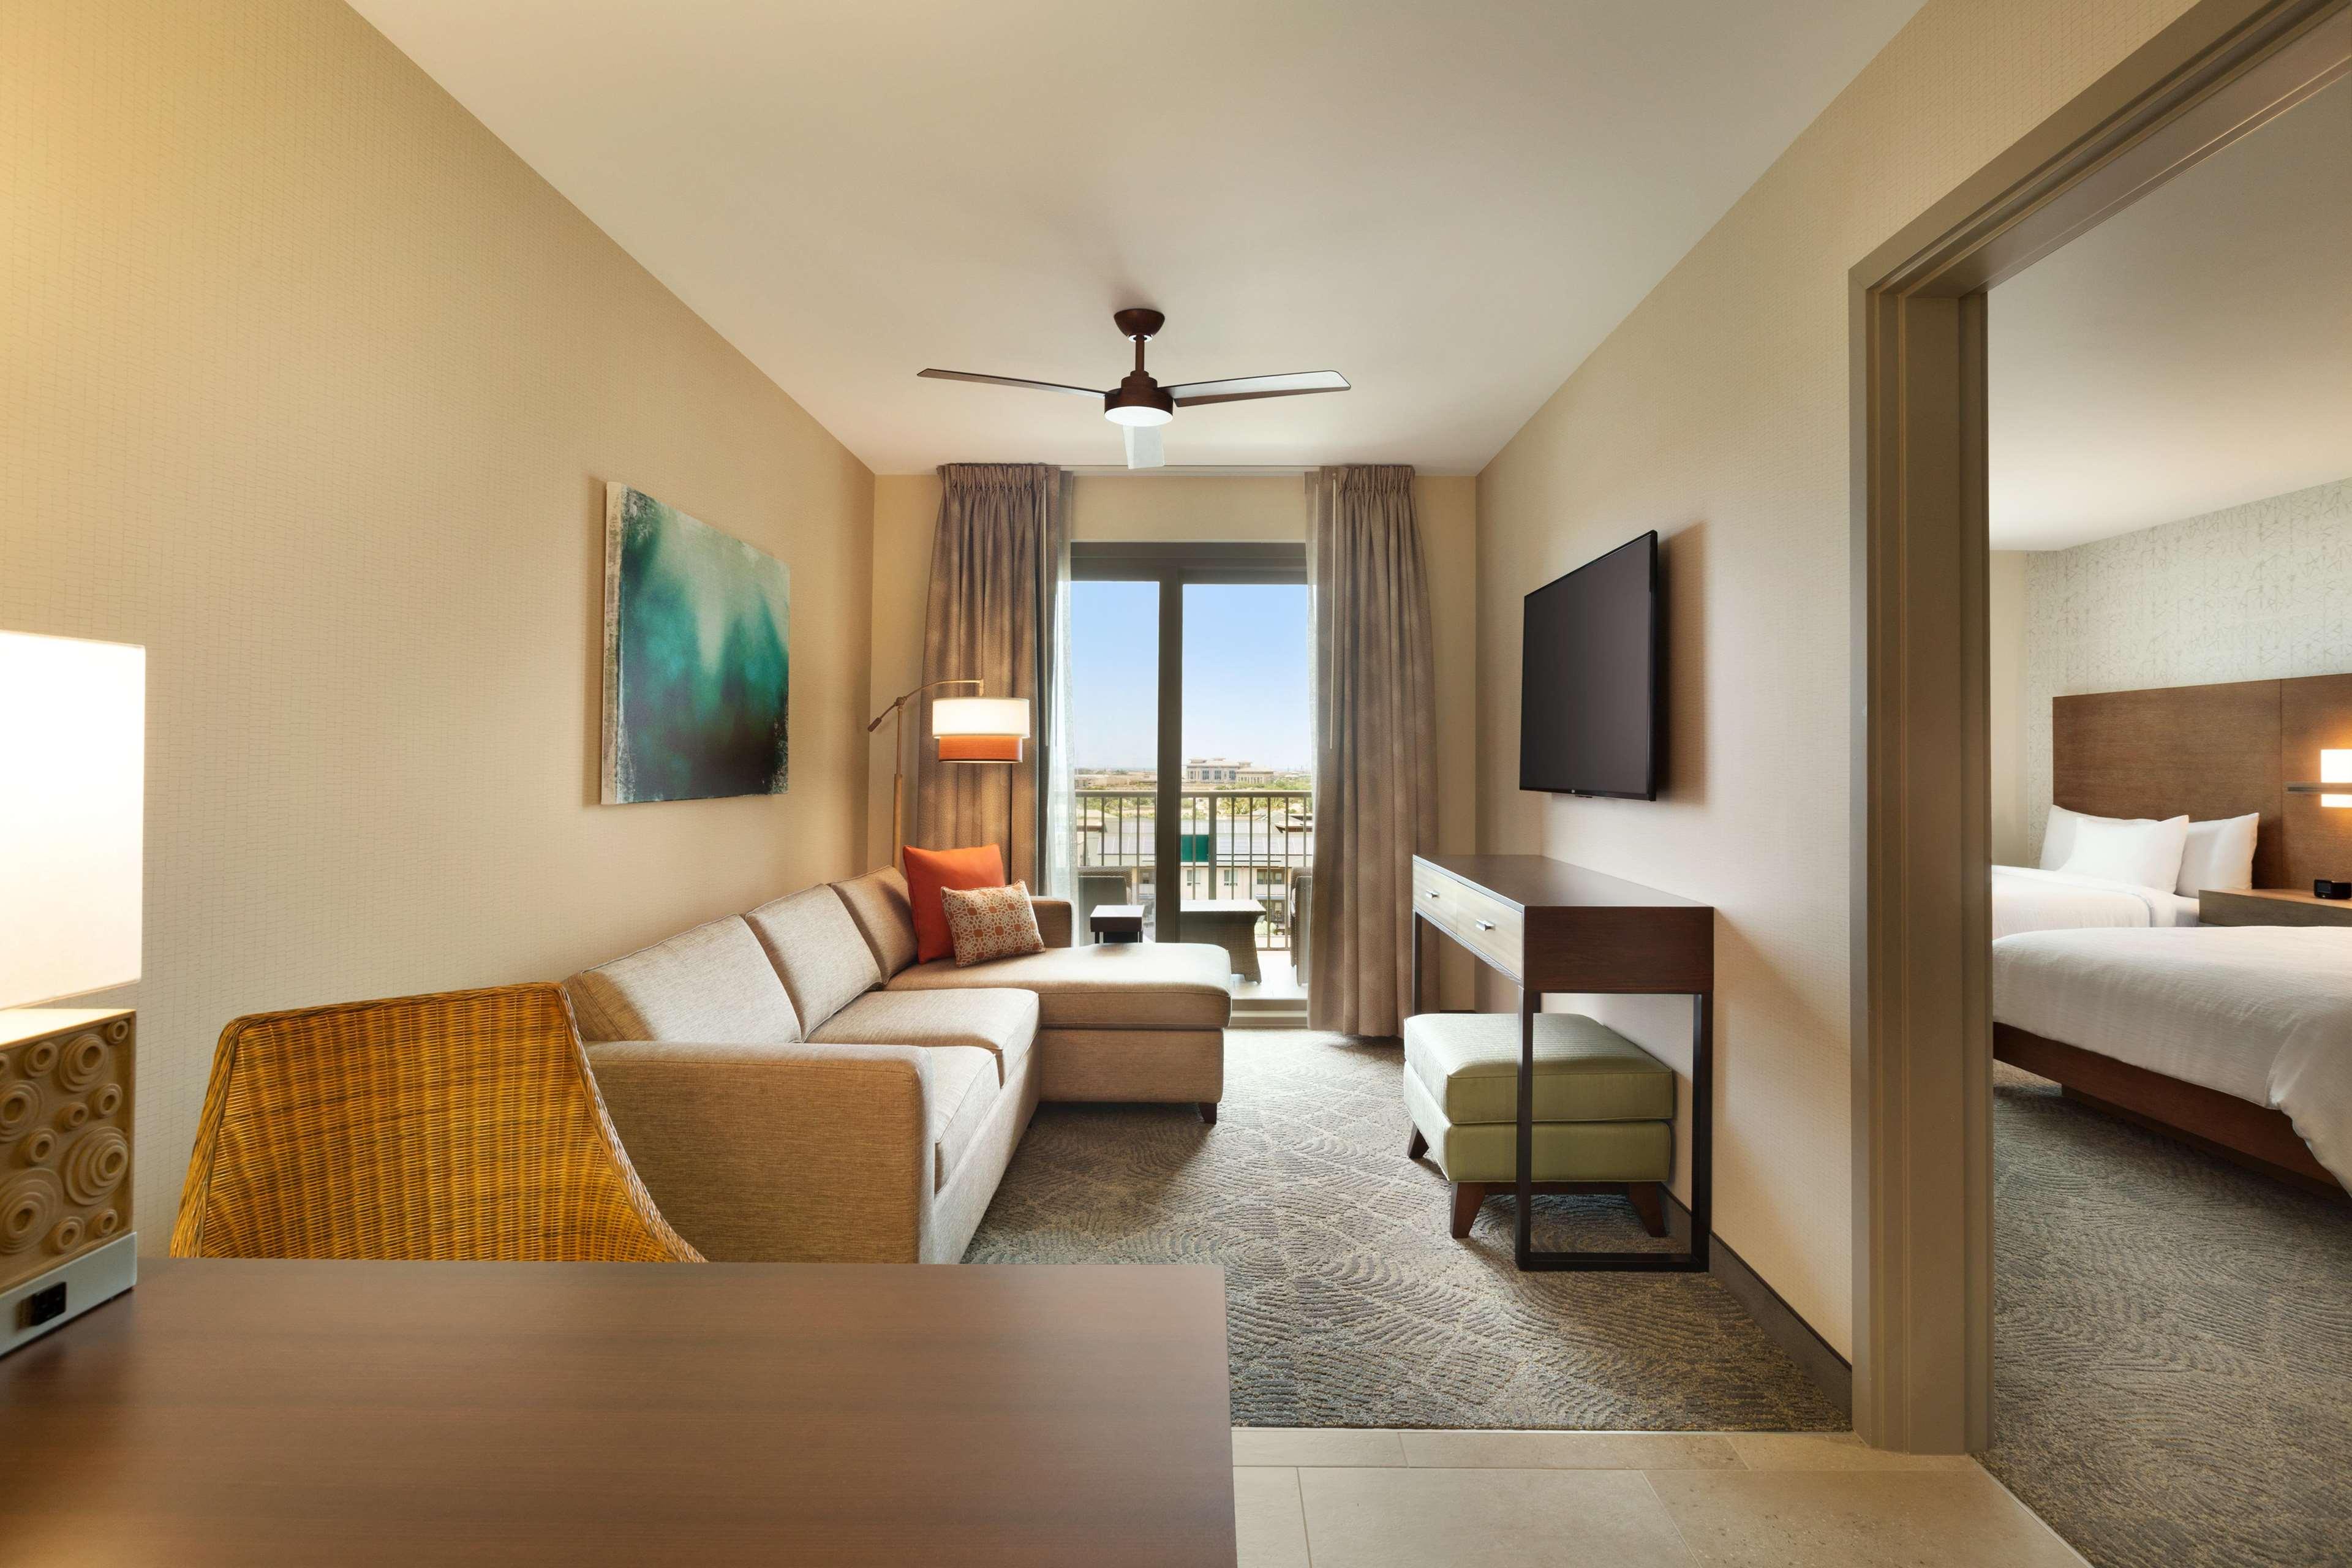 Embassy Suites by Hilton Oahu Kapolei image 40